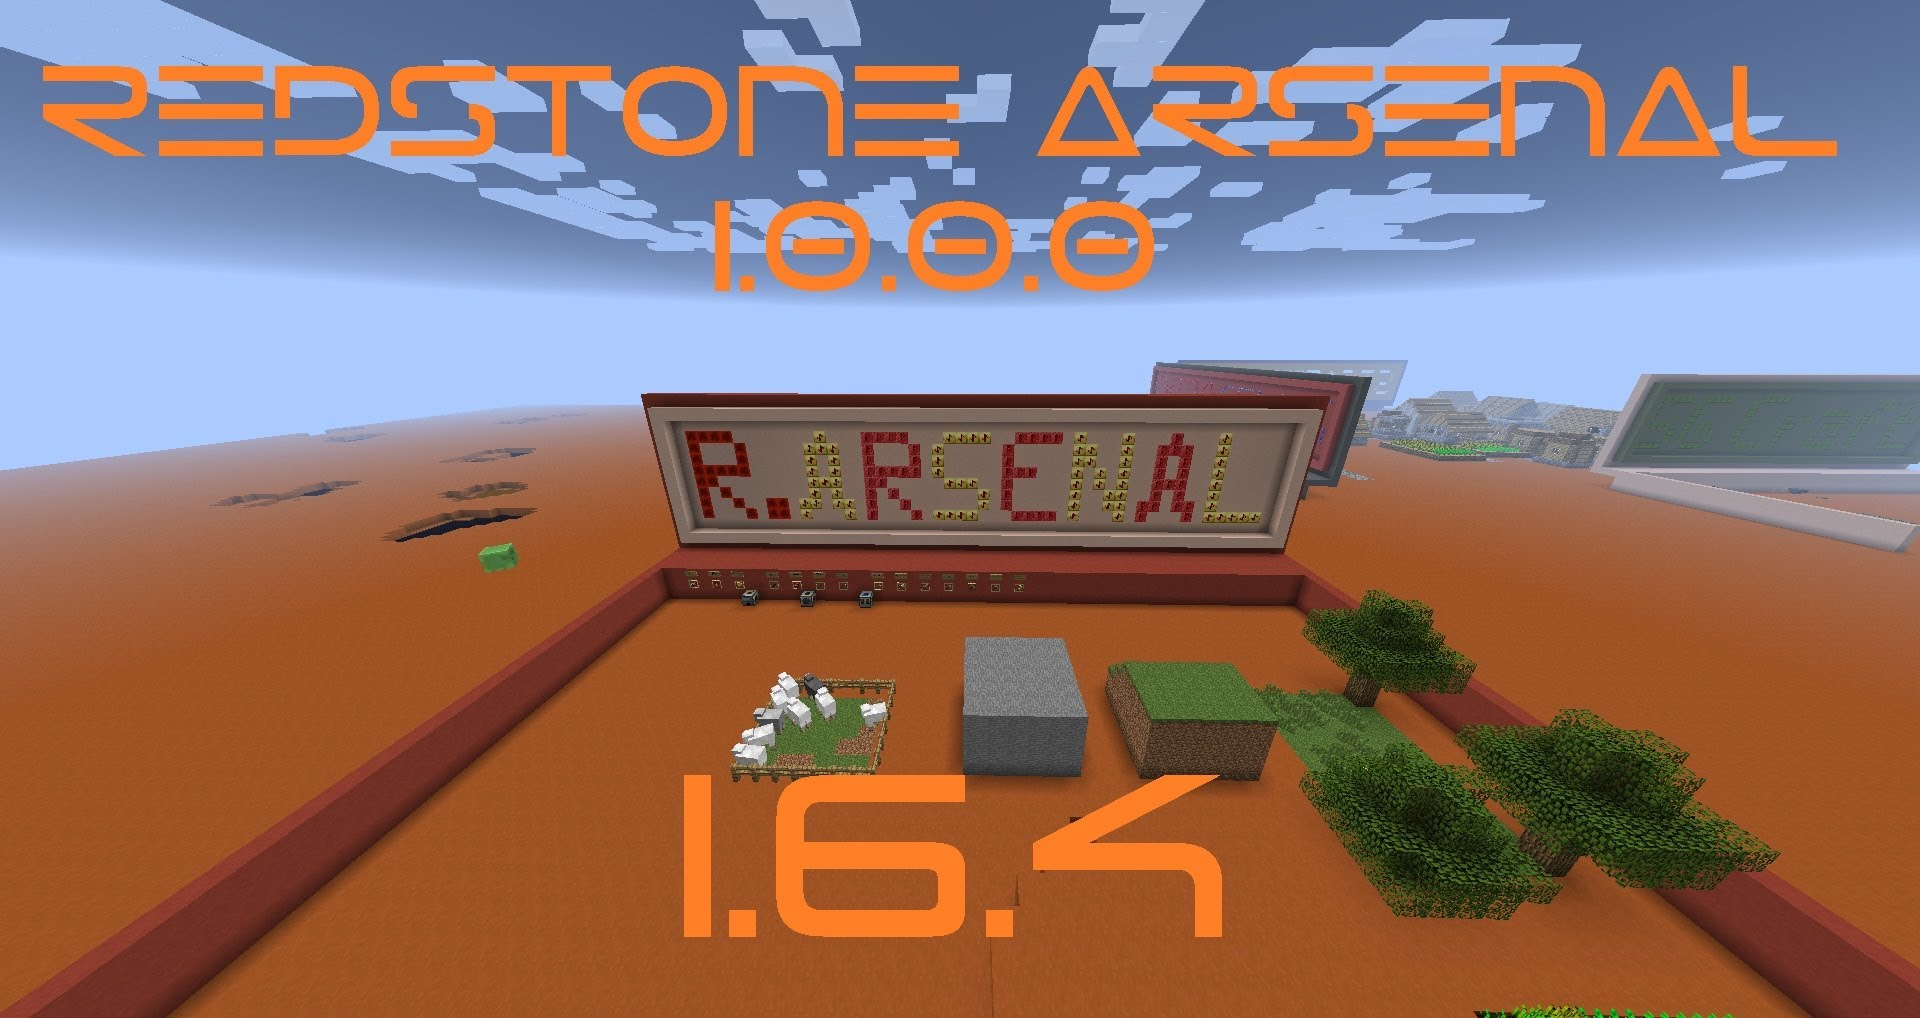 Redstone-Arsenal-Mod-1.jpg